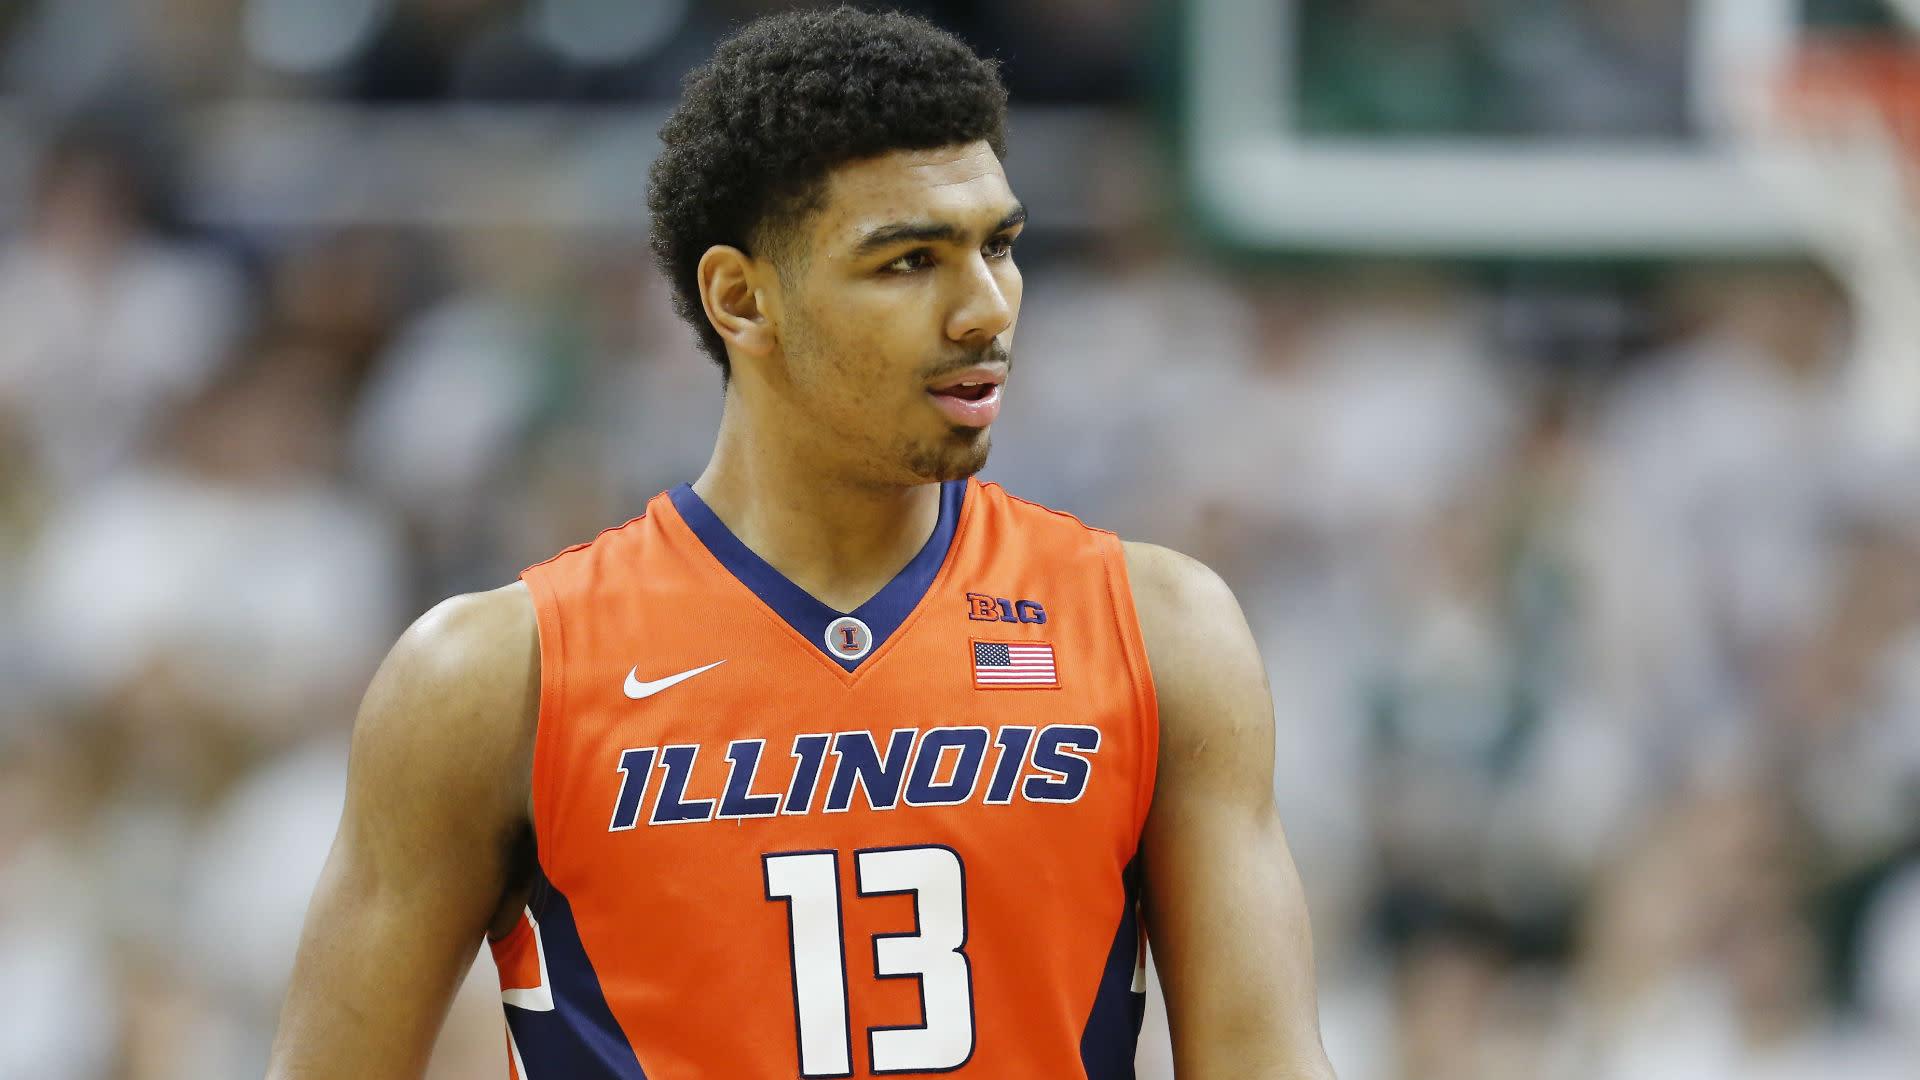 Mark Smith to transfer from Illinois